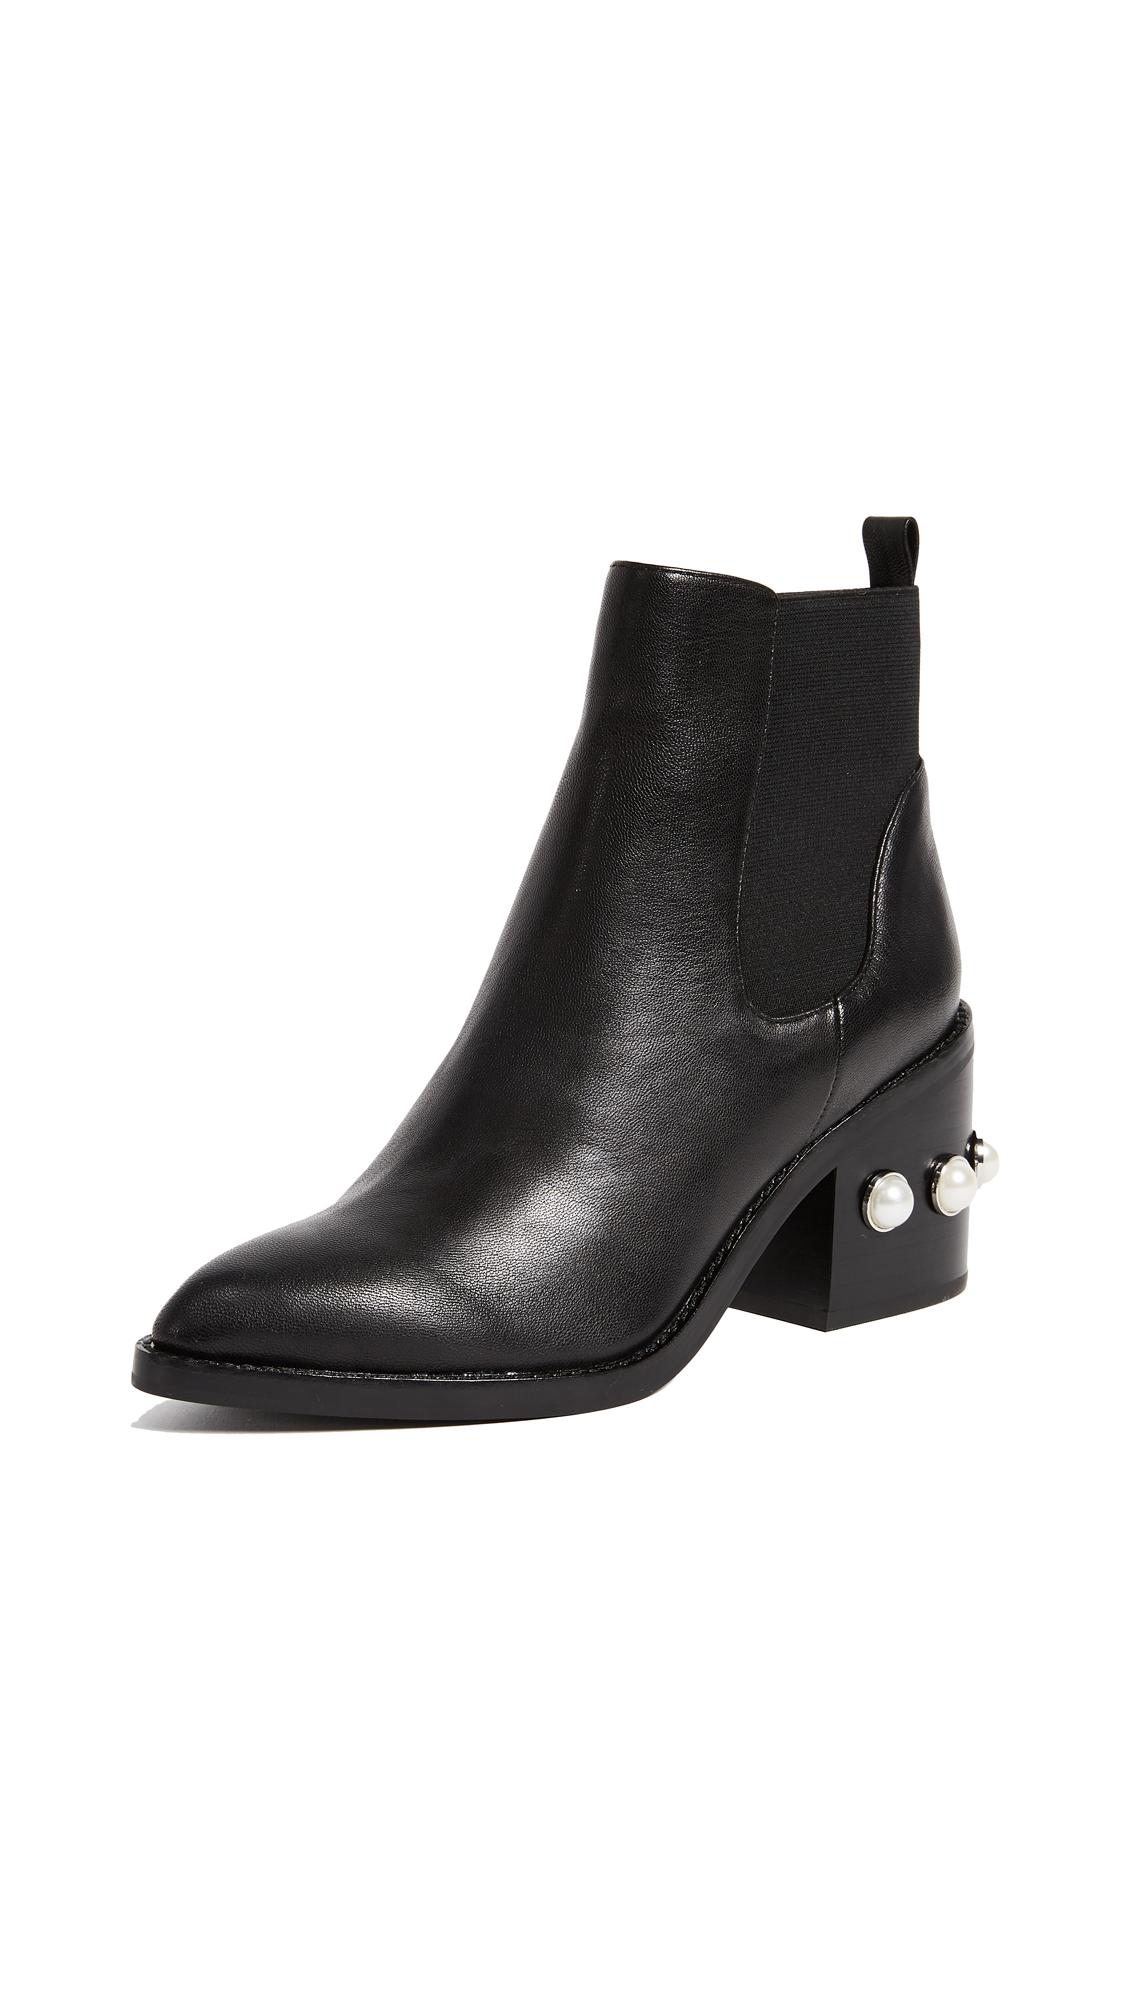 Sol Sana Victoria Ankle Boots - Black